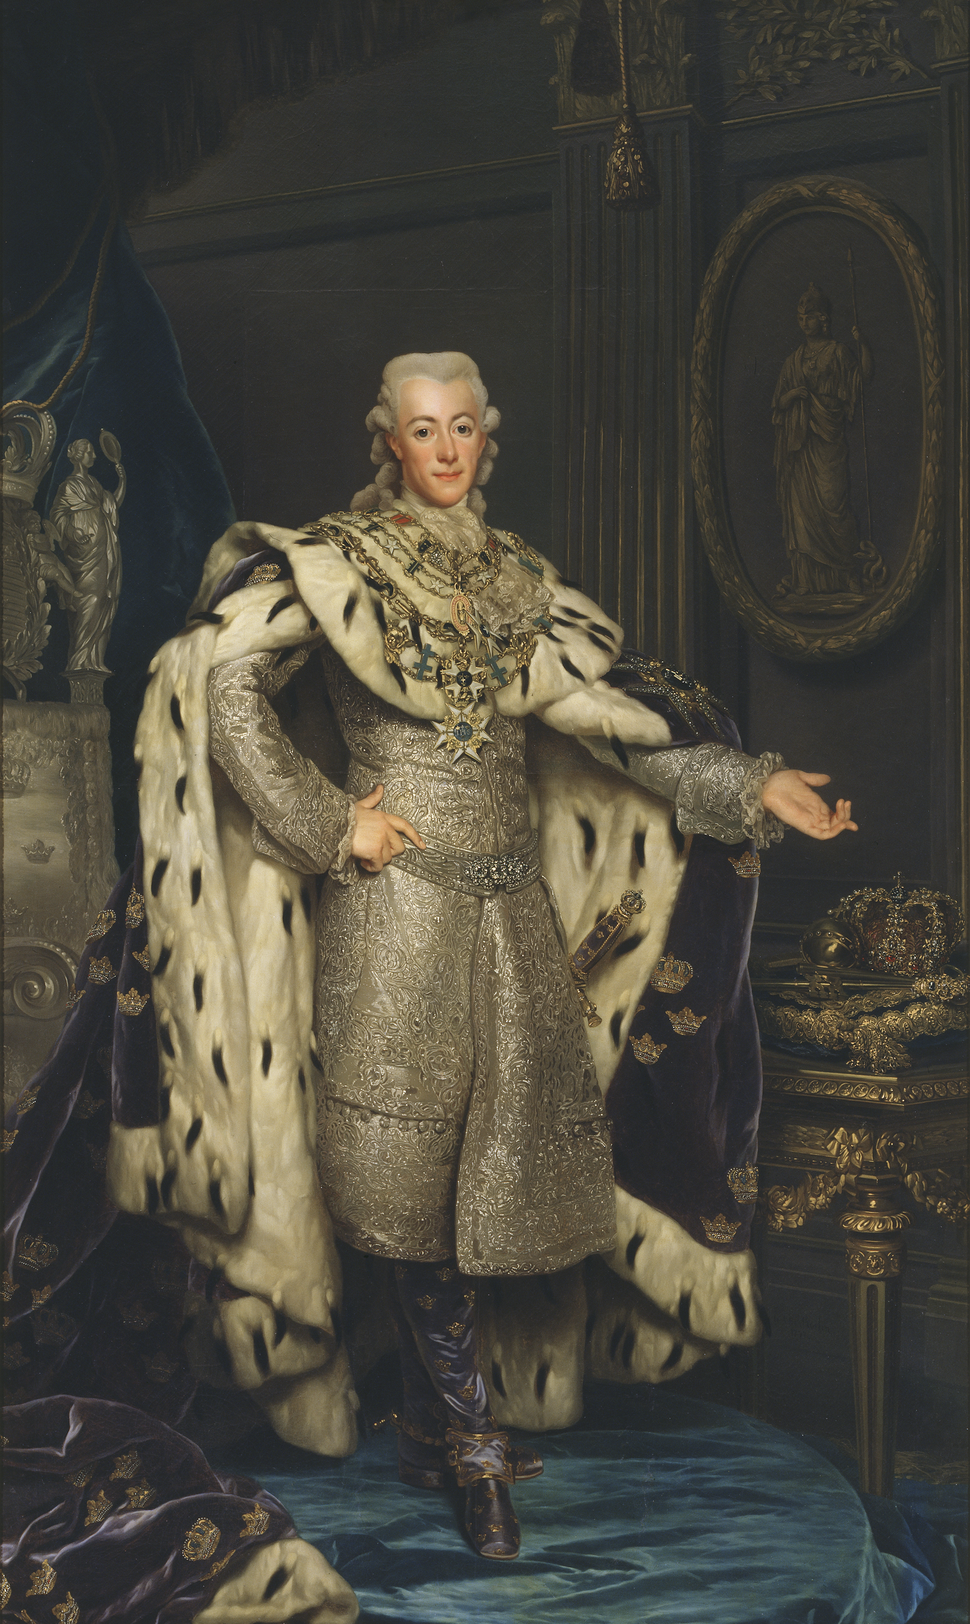 Gustav III by Alexander Roslin - no frame (Nationalmuseum, 15330)